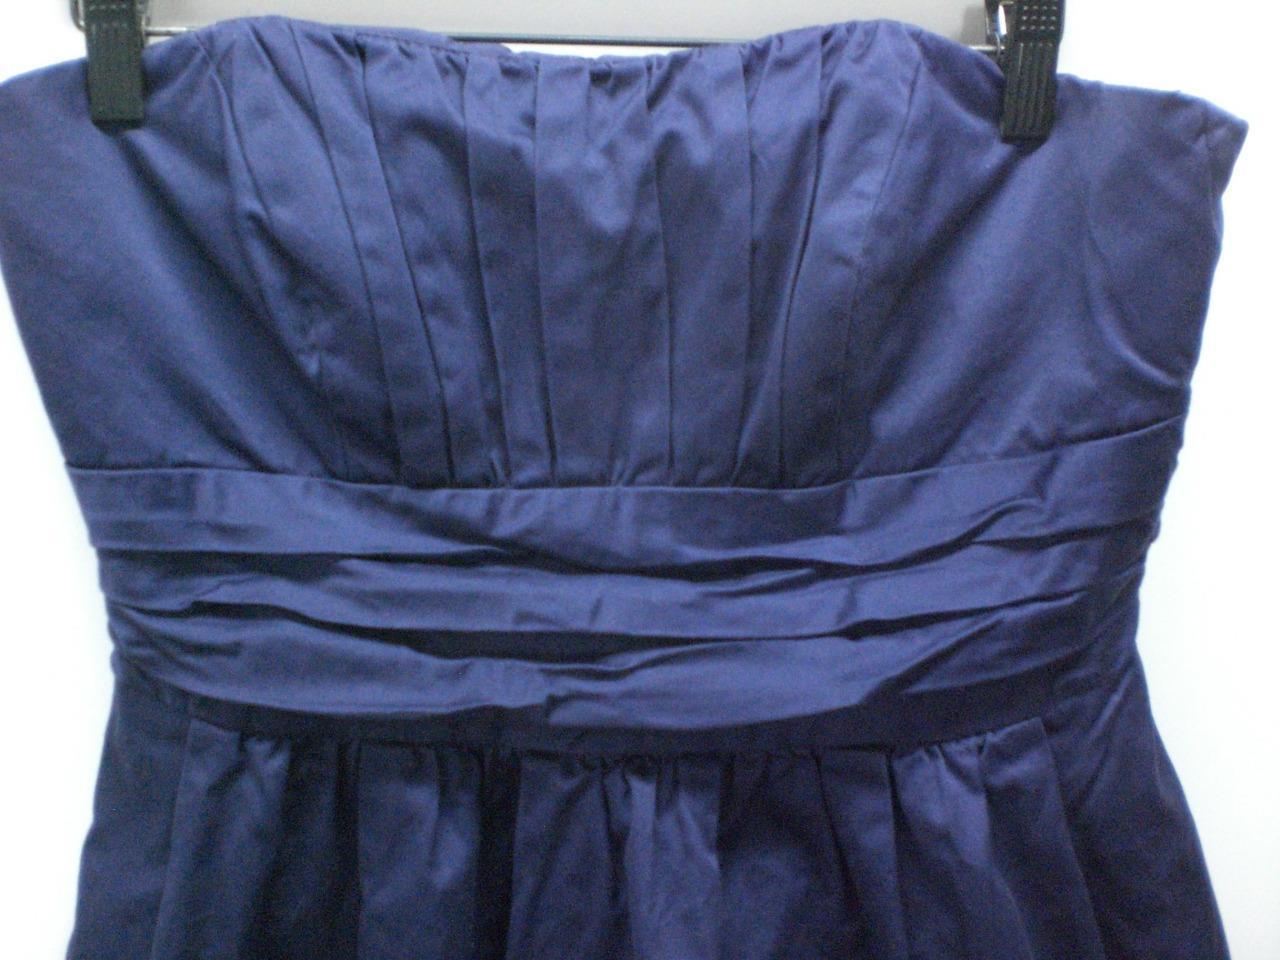 W13895 Womens DAVIDS BRIDAL Plum Purple 83312 Strapless BRIDESMAID DRESS 10